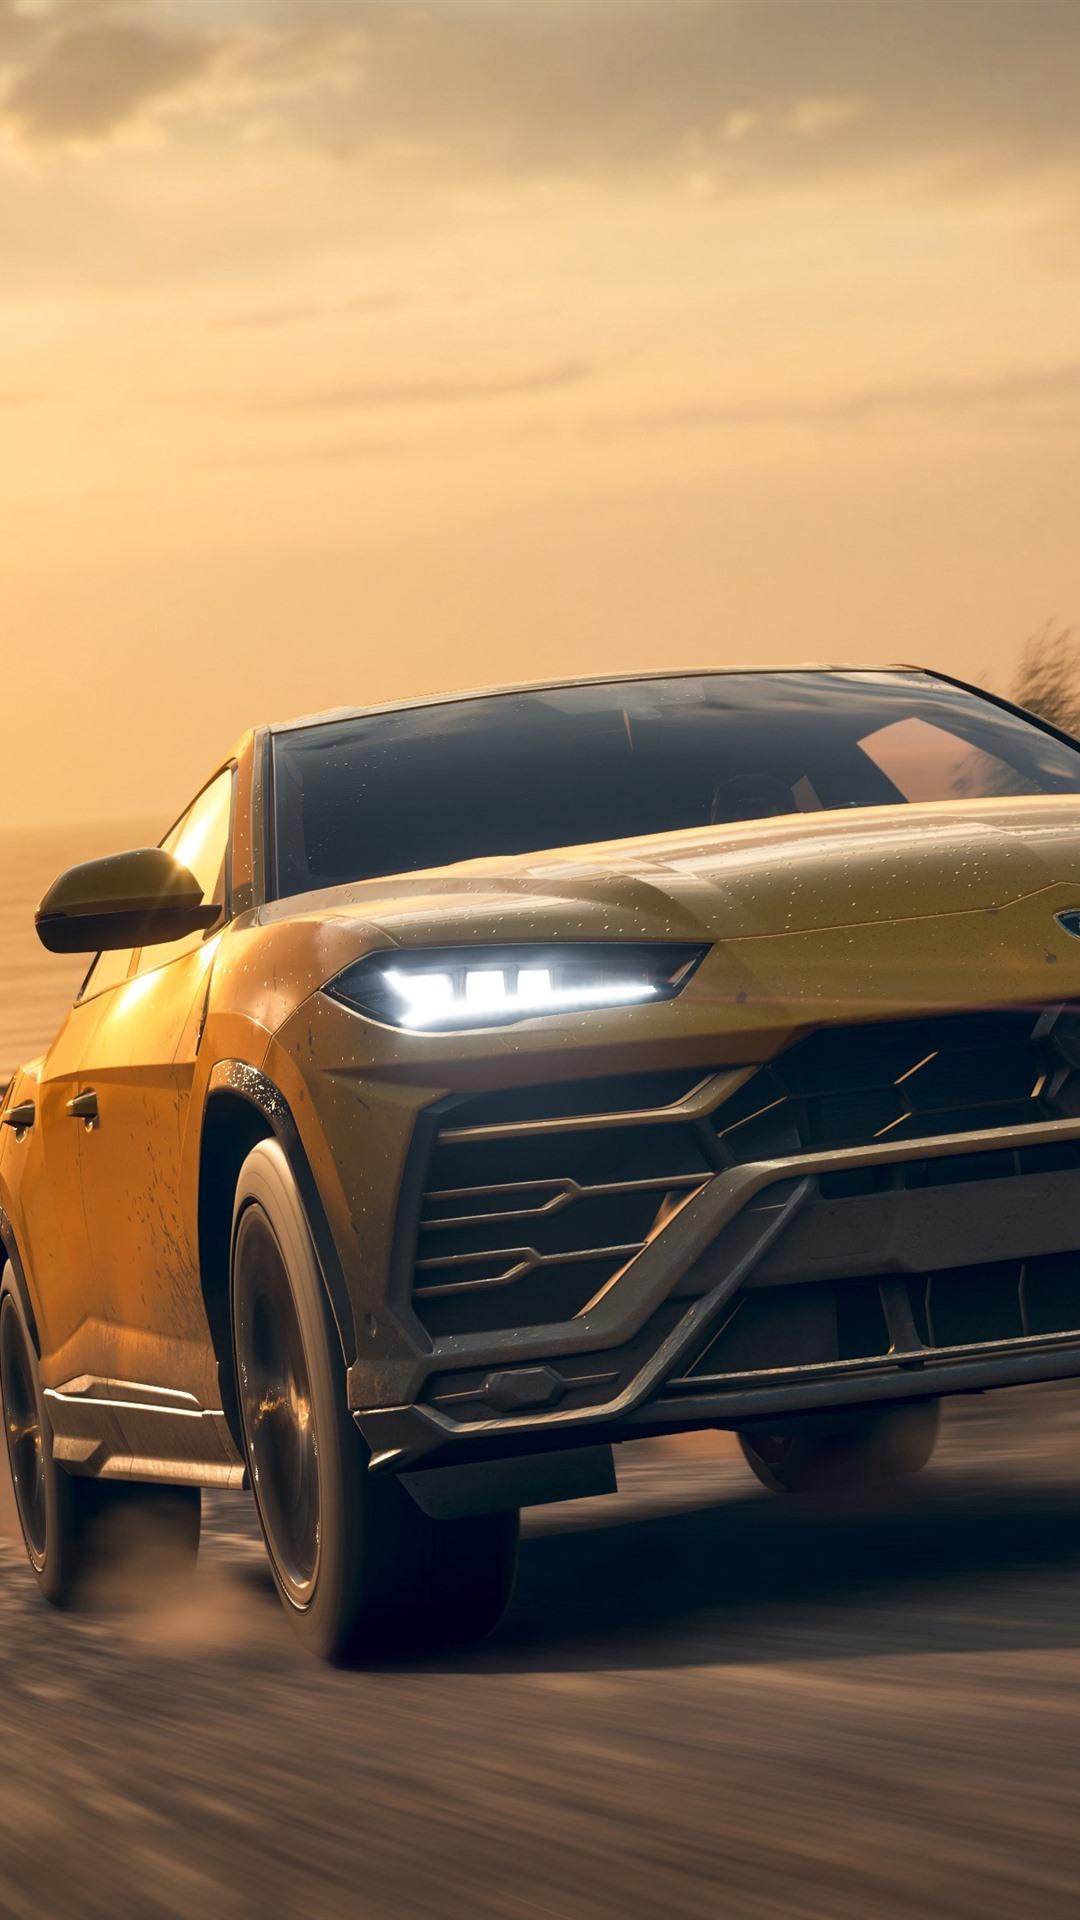 Forza Horizon 4 Lamborghini Urus Suv Car Front View 1080x1920